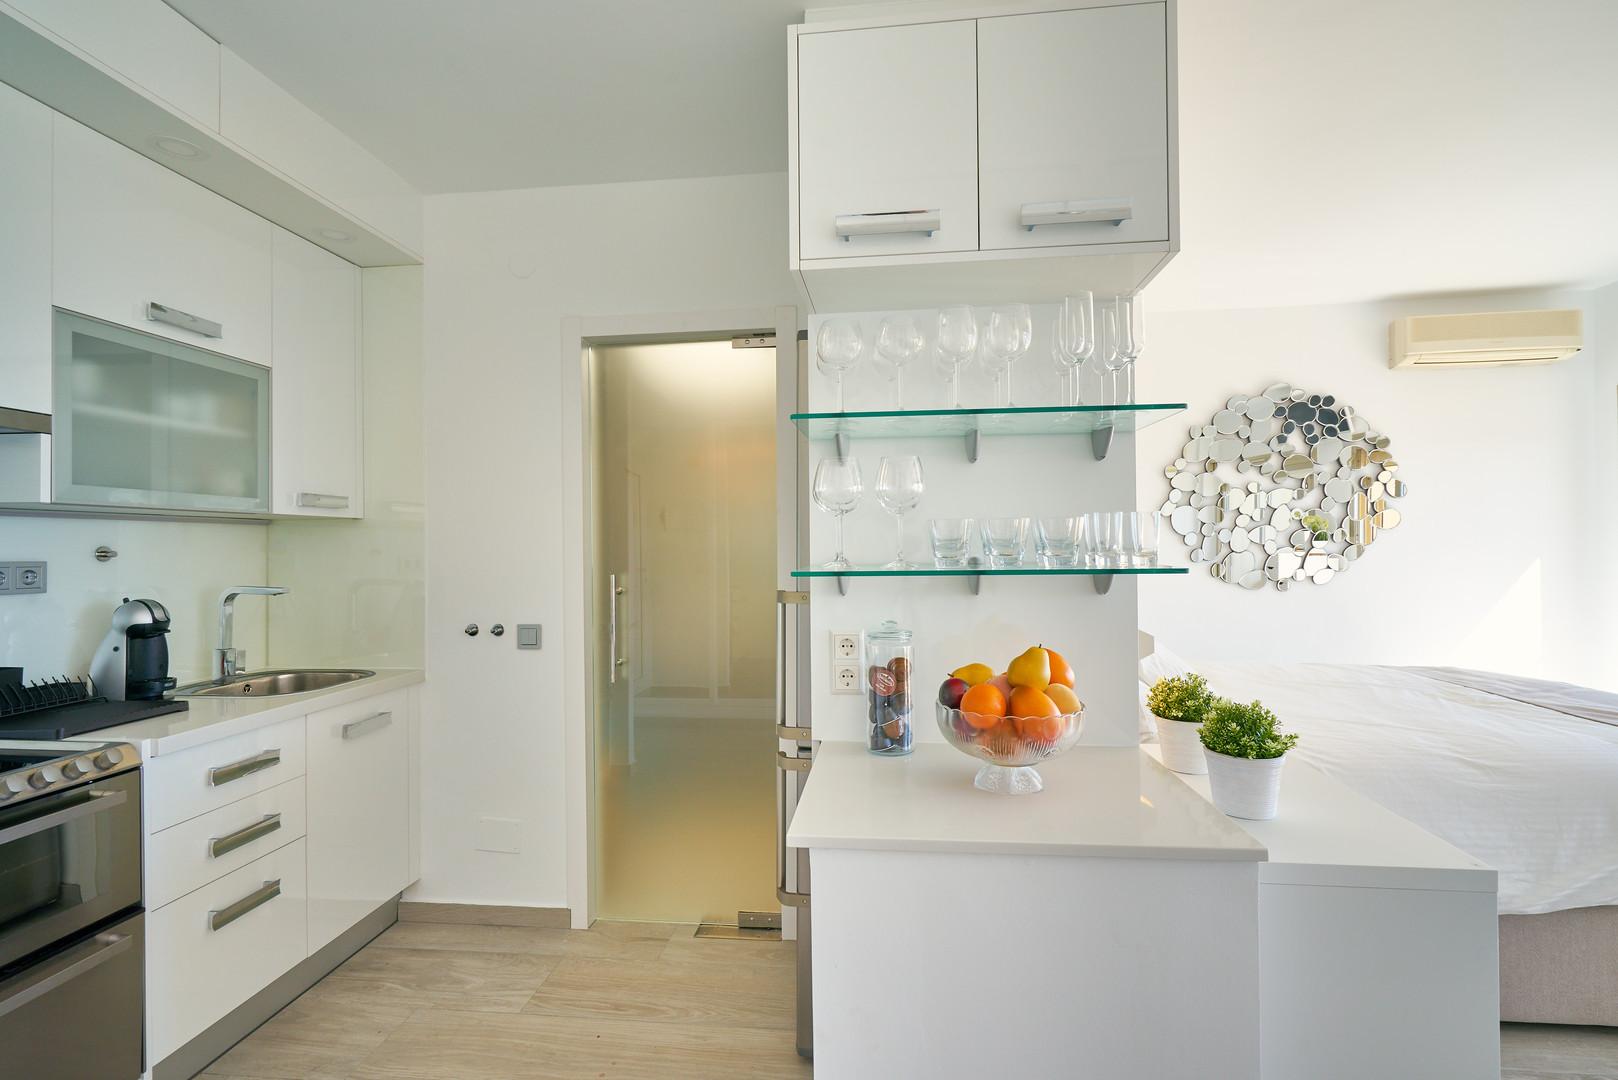 205 kitchen penthouse romana playa elvir